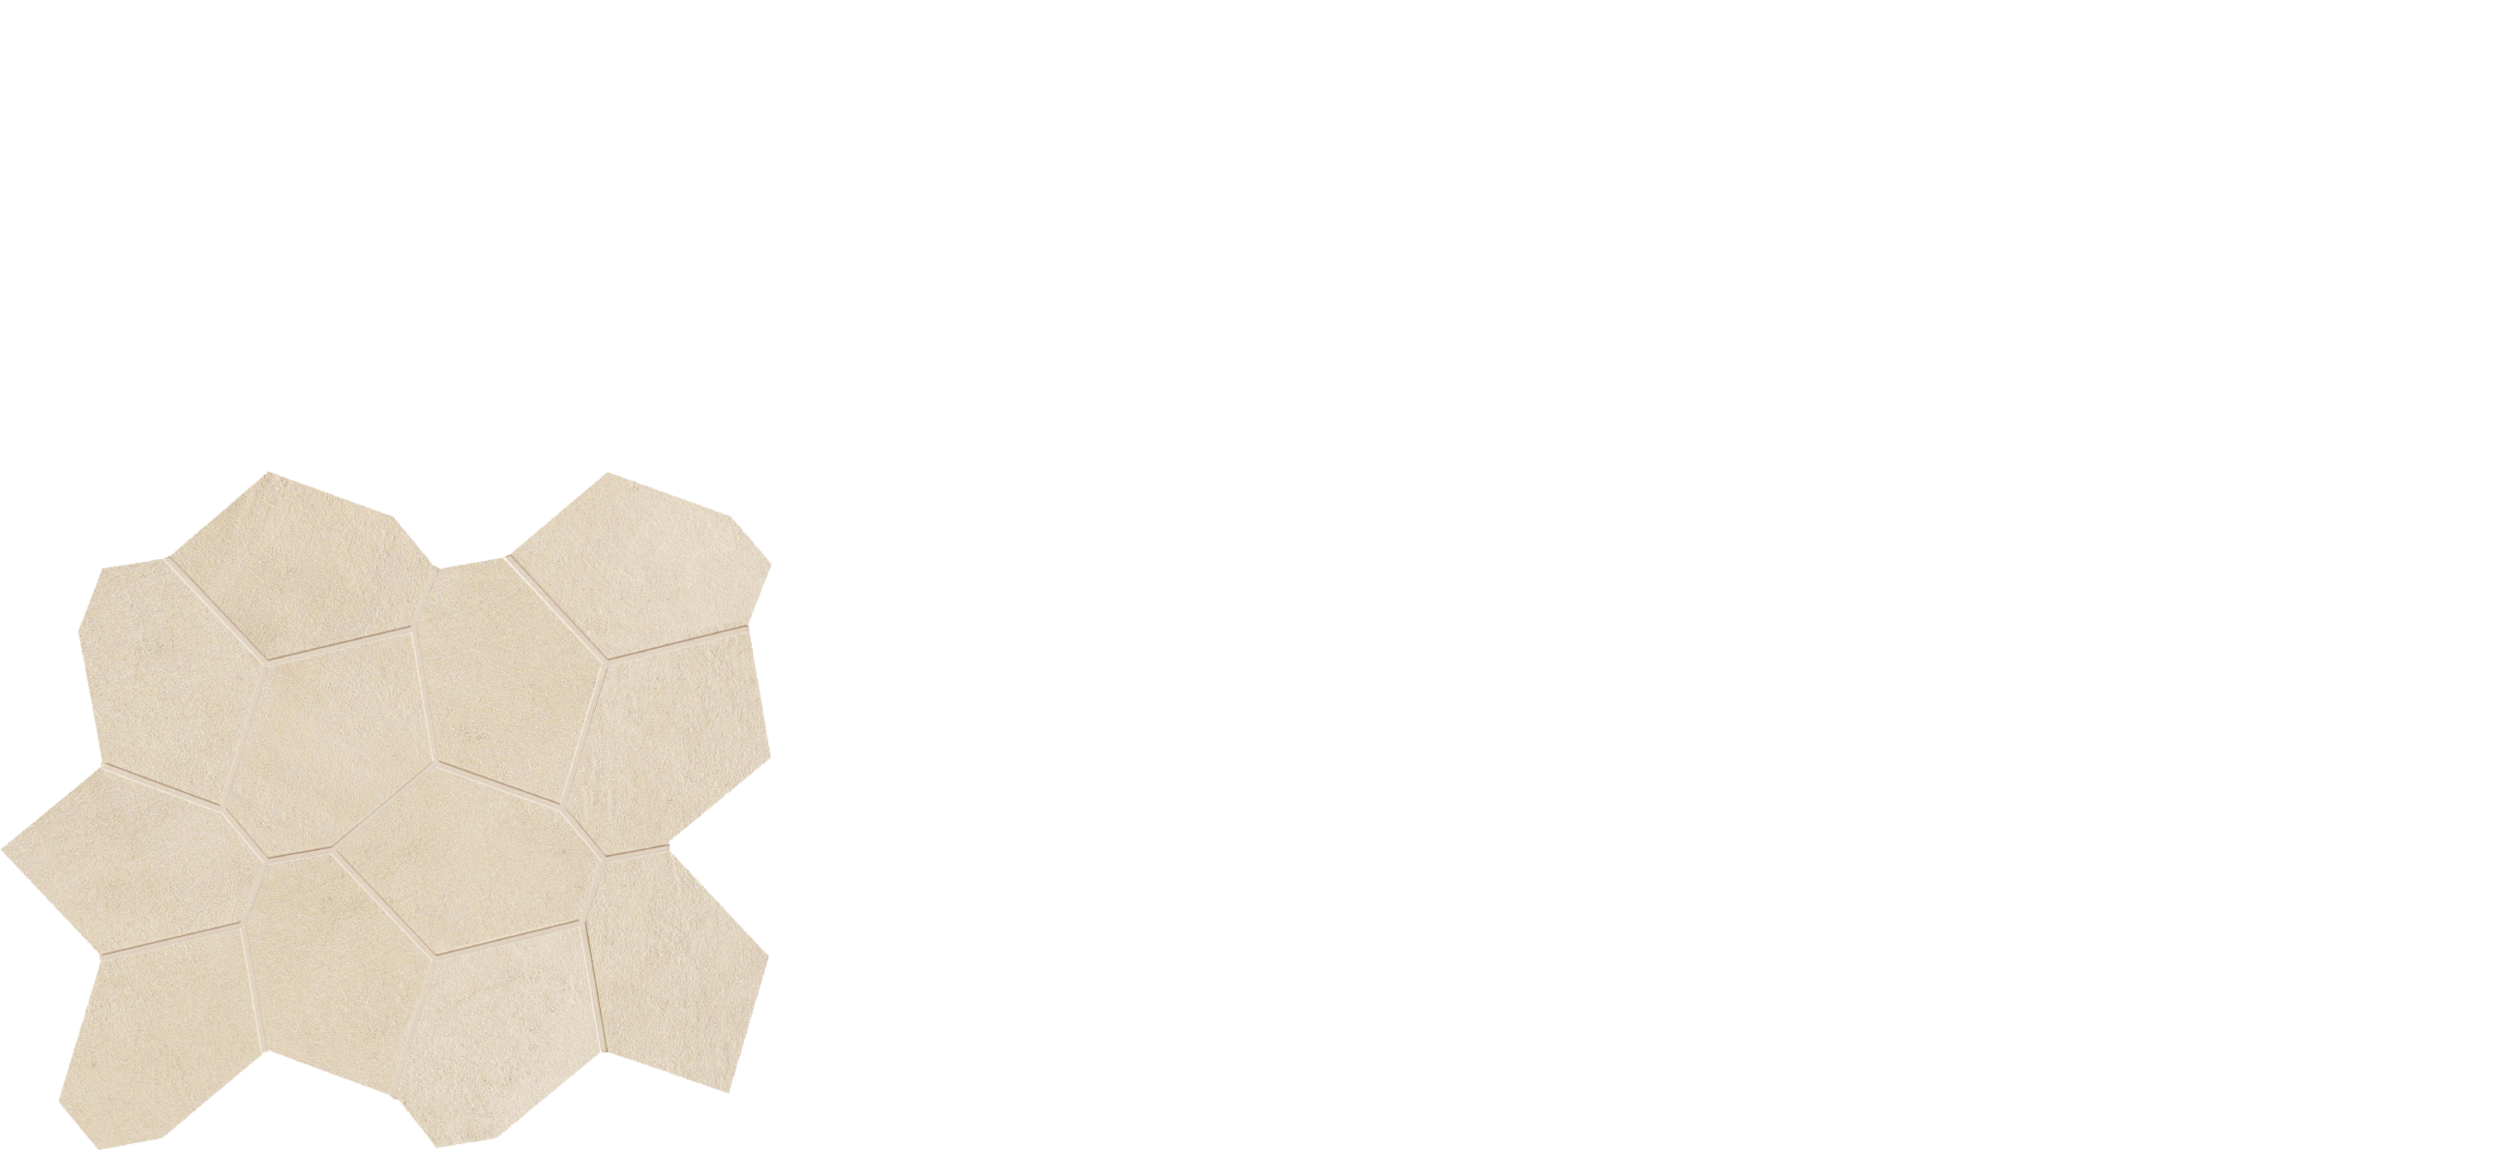 DCORMT02.png